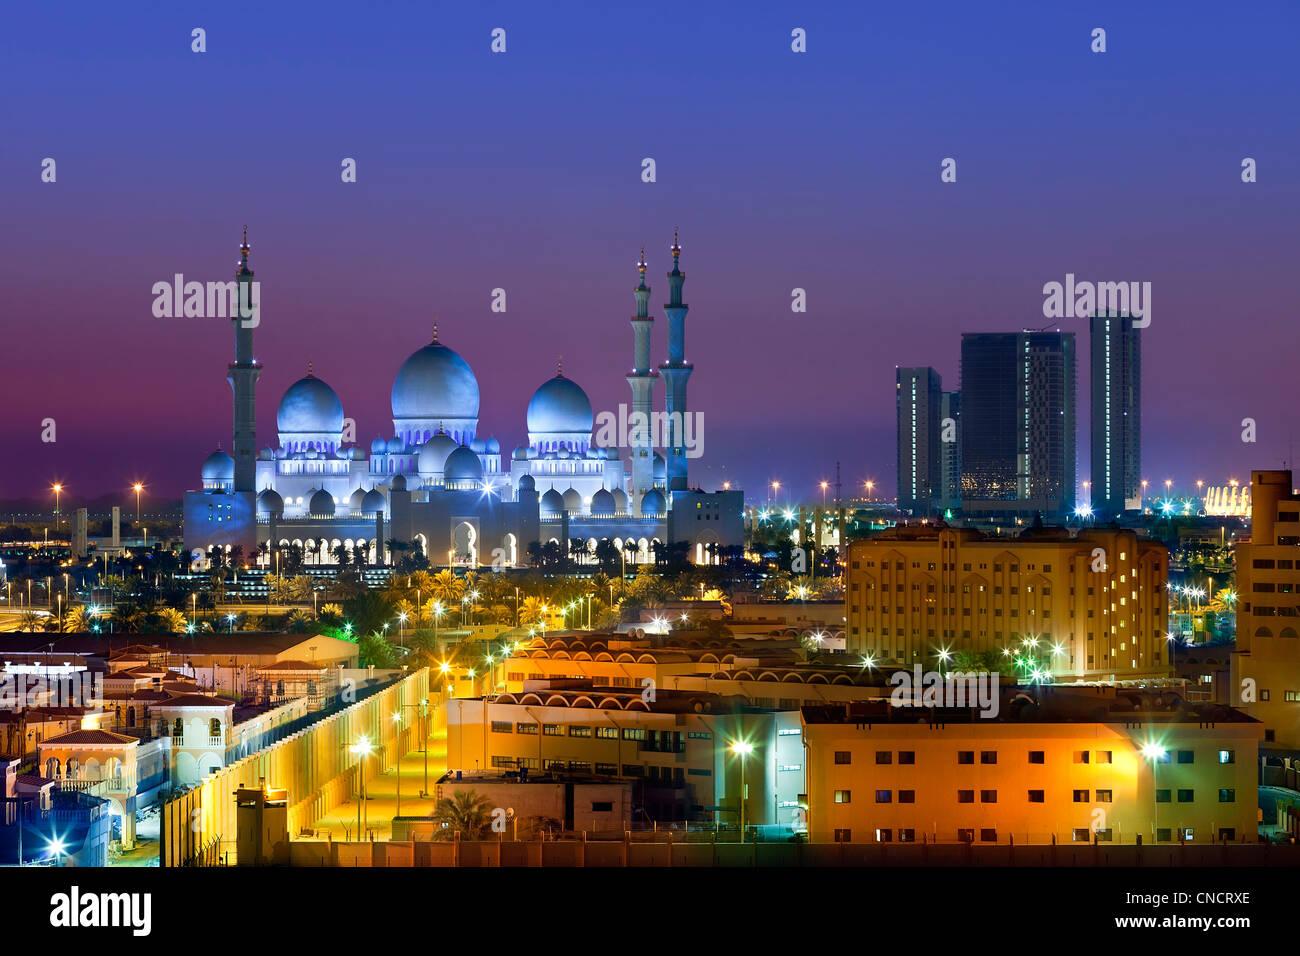 Abu Dhabi , Sheikh Zayed Mosque - Stock Image